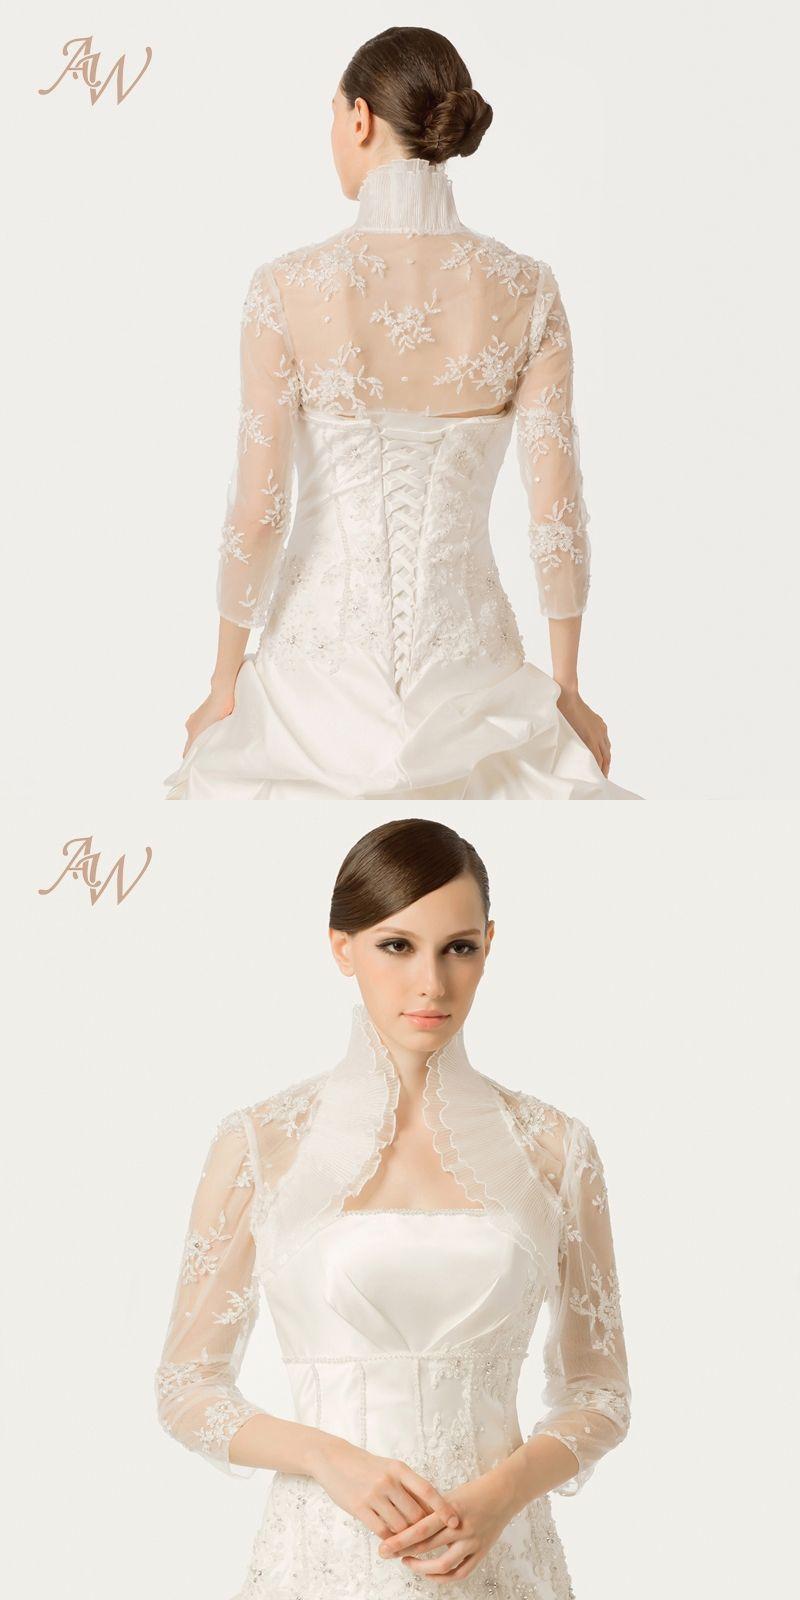 b0d3eb8d28 AW Ivory Lace 3 4 Sleeves Ruffled Neck Bridal Wrap Jackets Bolero Shaw for  Wedding